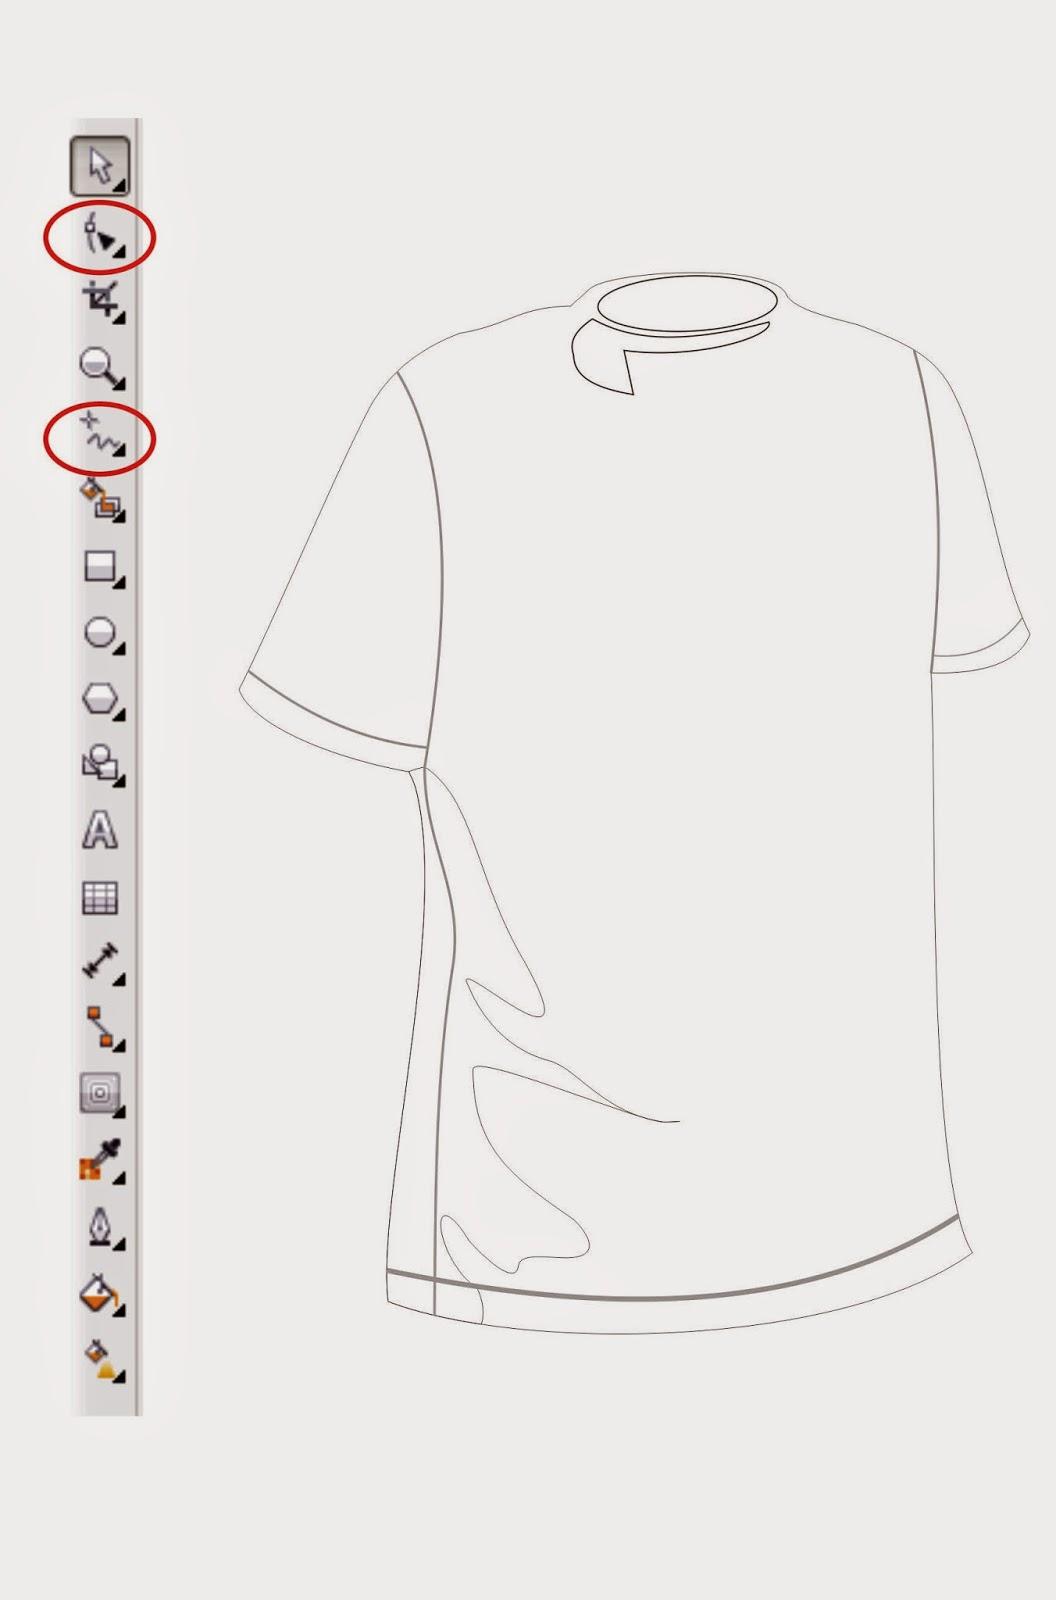 Menambah detail pada Kaos